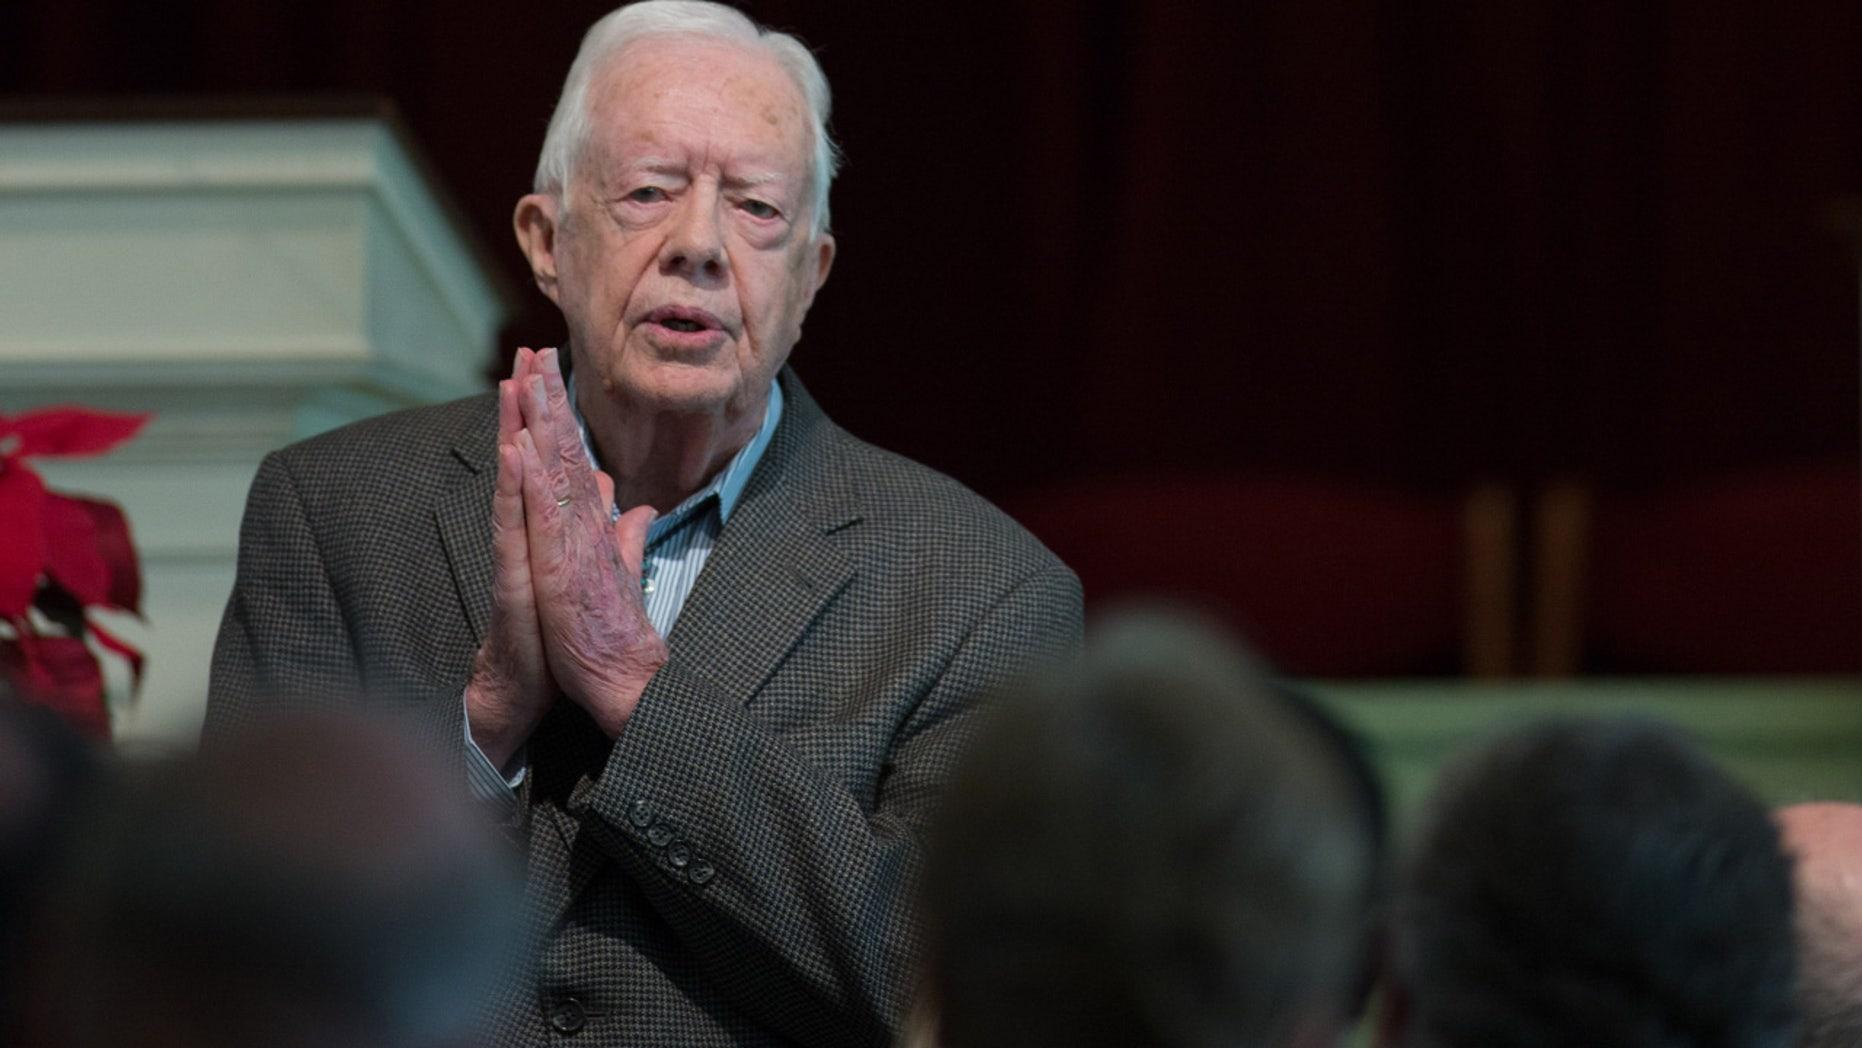 Former President Jimmy Carter teaches during Sunday School class at Maranatha Baptist Church in his hometown, Sunday, Dec. 13, 2015, in Plains, Ga. (AP Photo/Branden Camp)